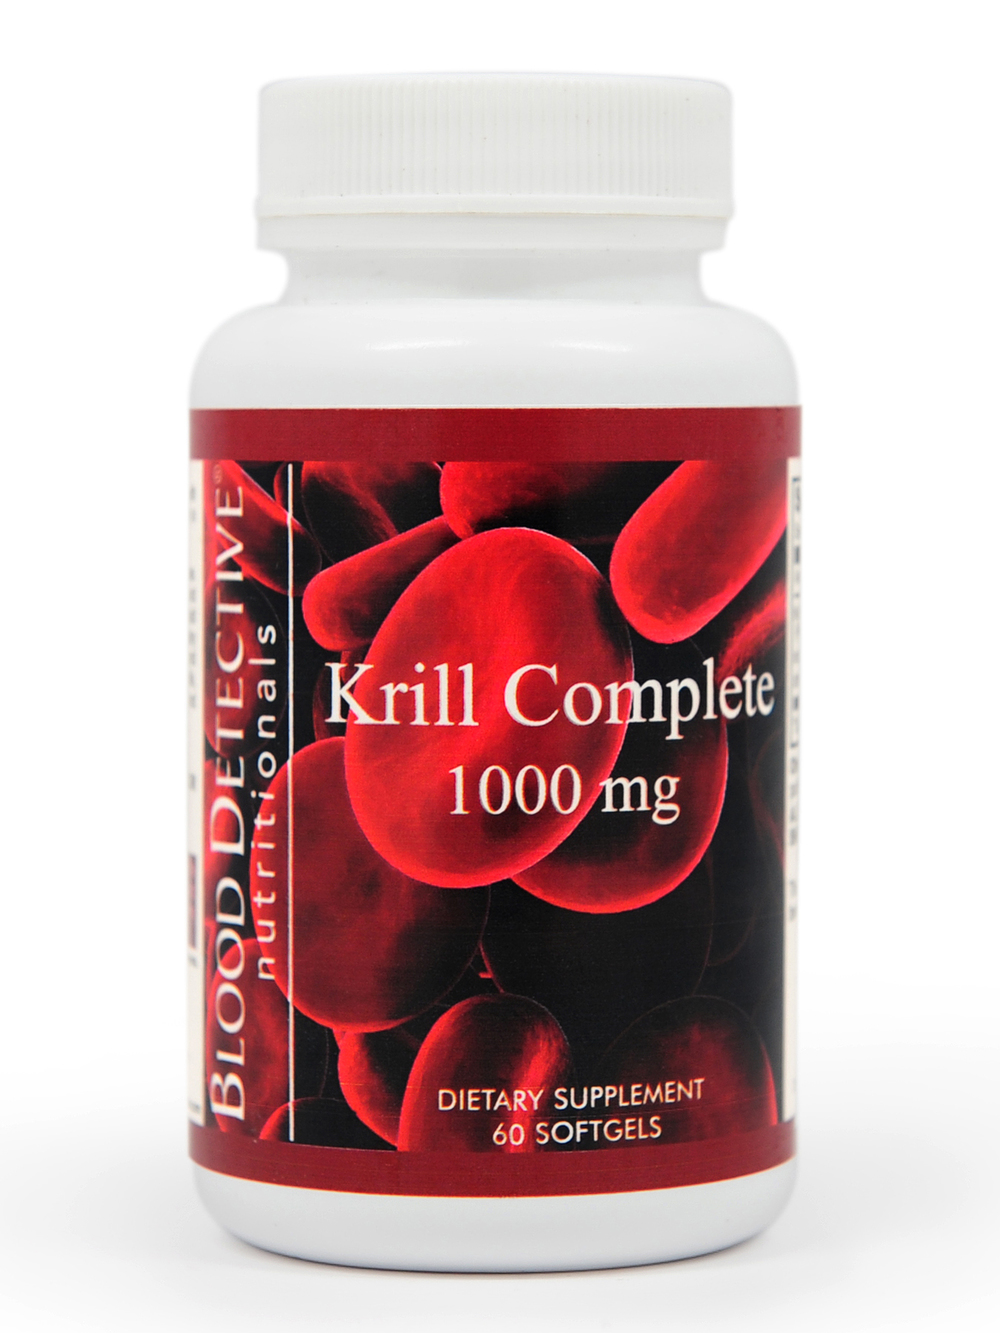 krill complete.jpg